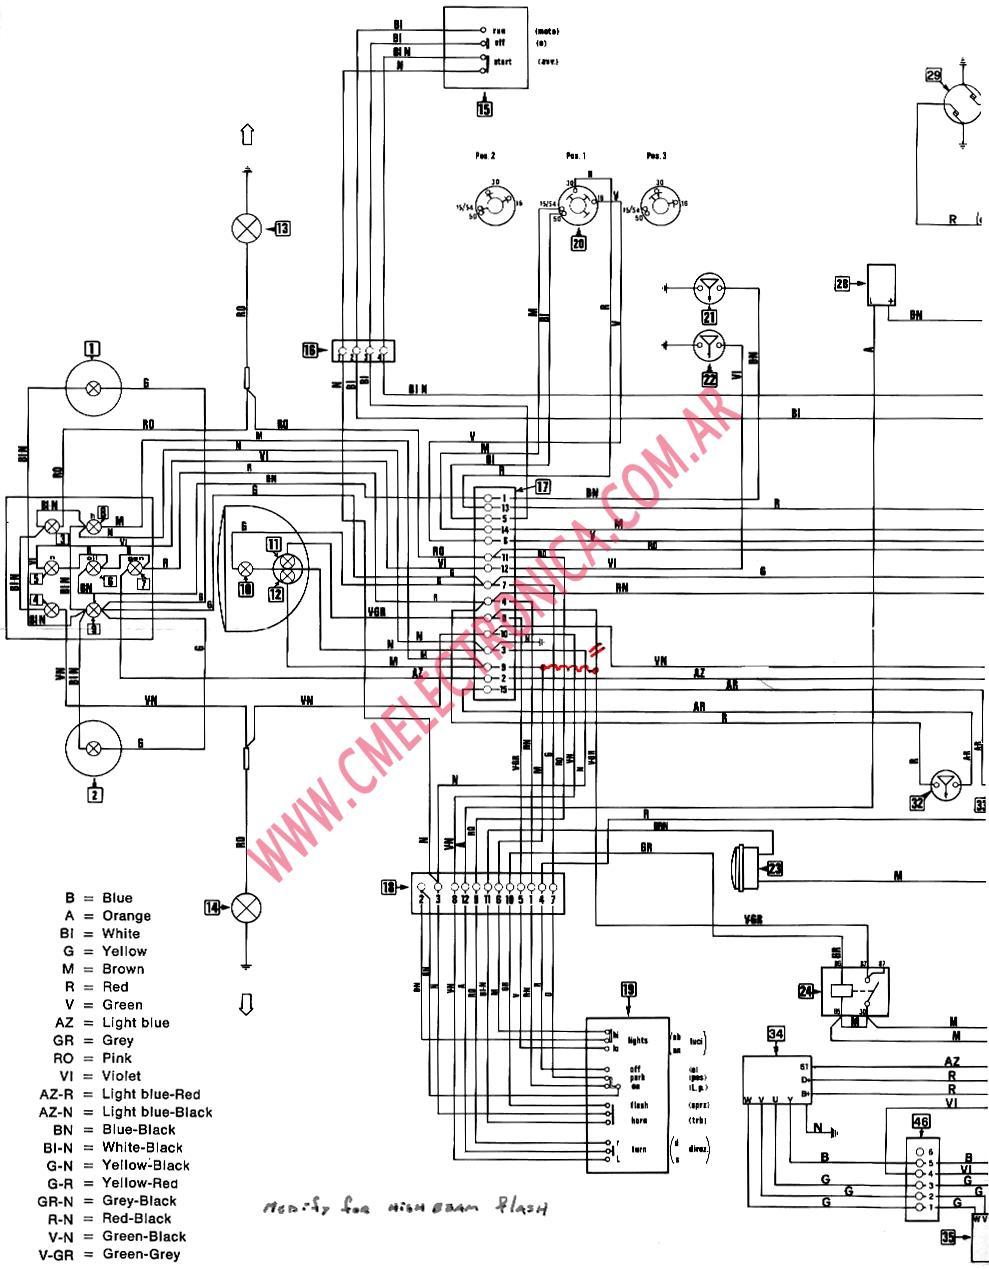 hight resolution of pin cdi wire diagram automotive wiring diagrams moto guzzi flasher pin cdi wire diagram moto guzzi